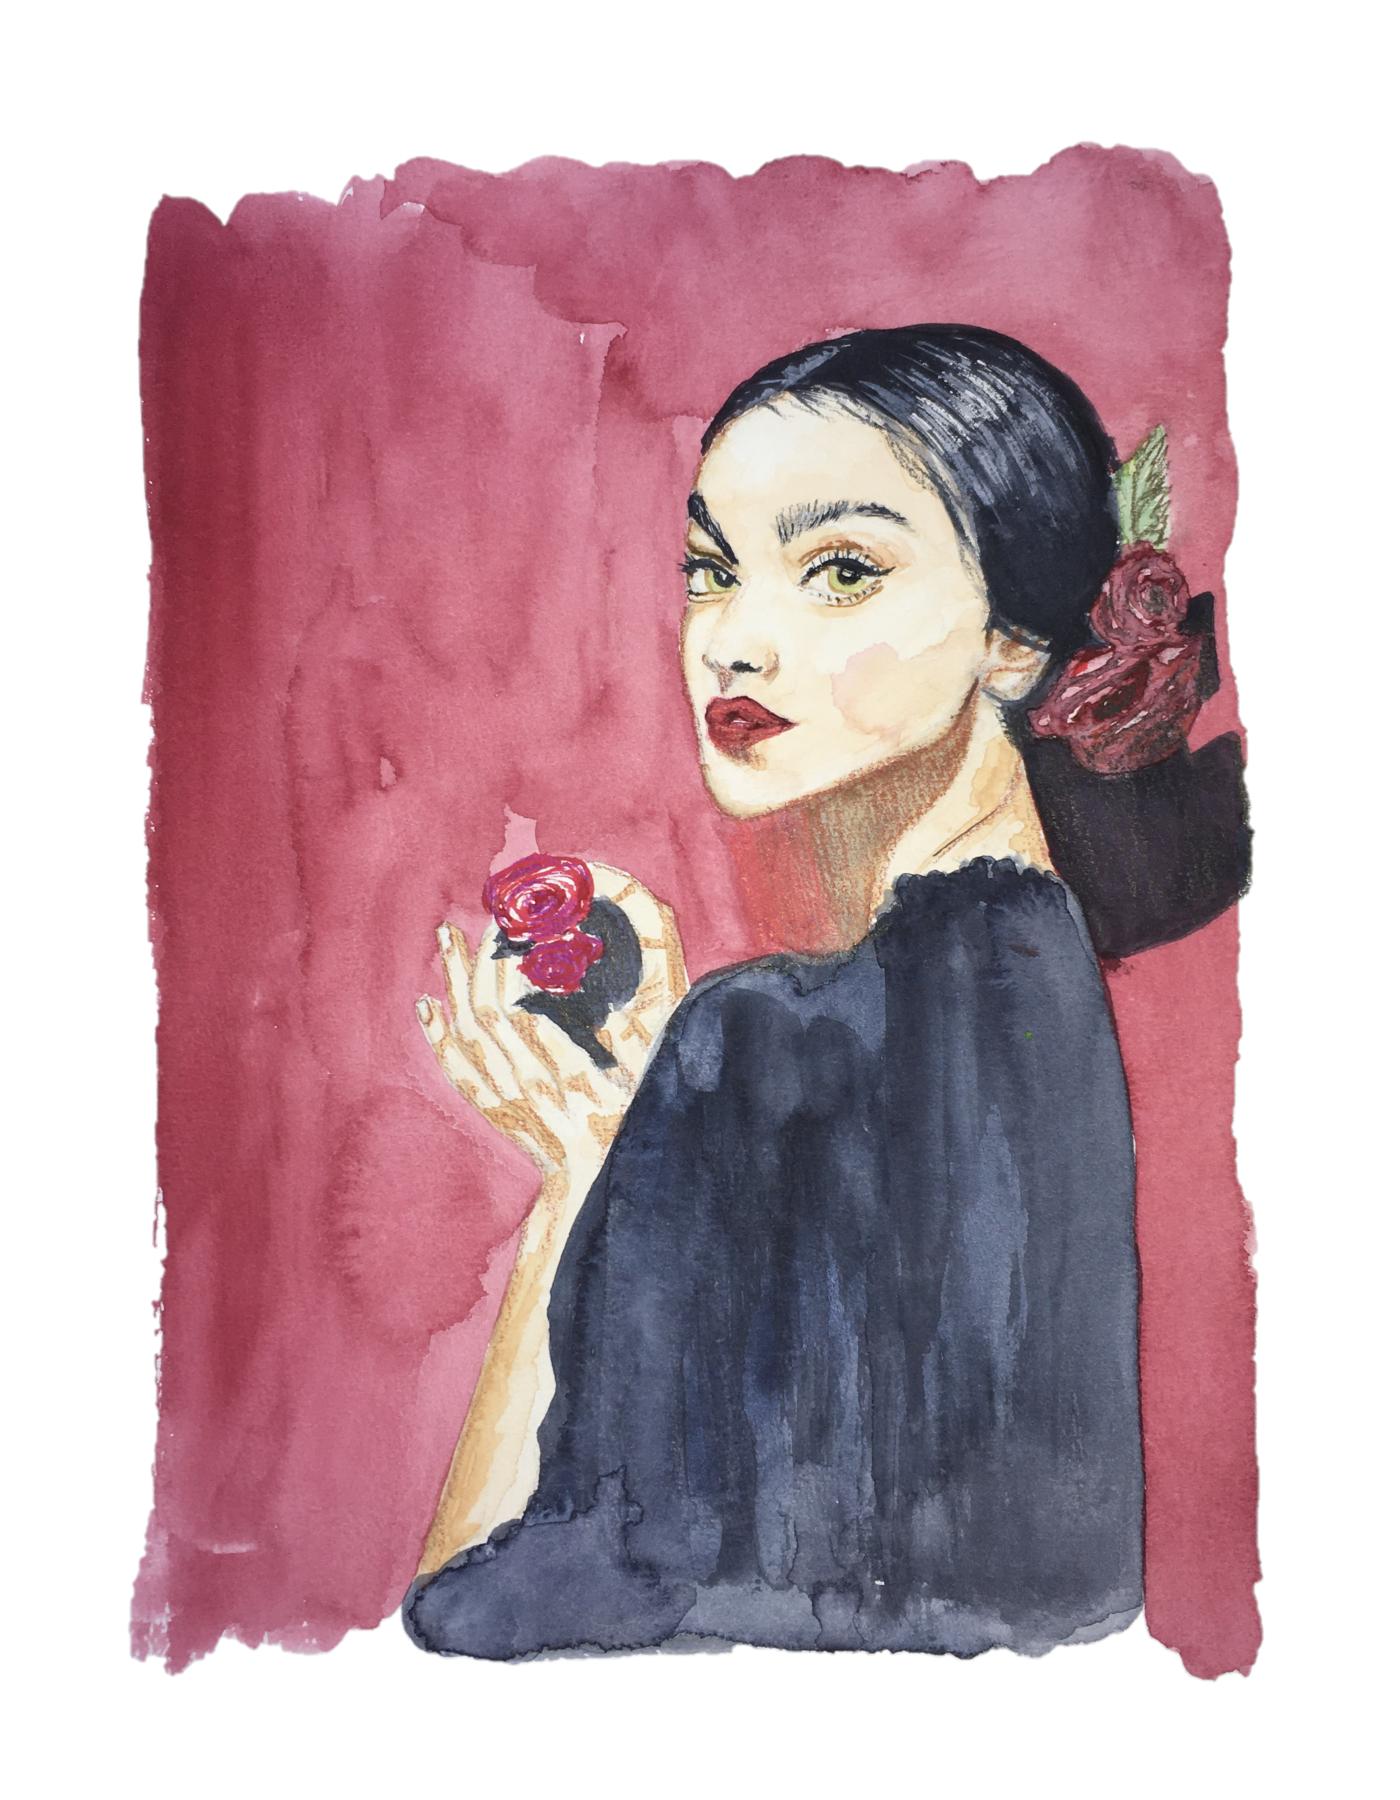 #watercolorportret #zhenyakatava #watercolorillustration